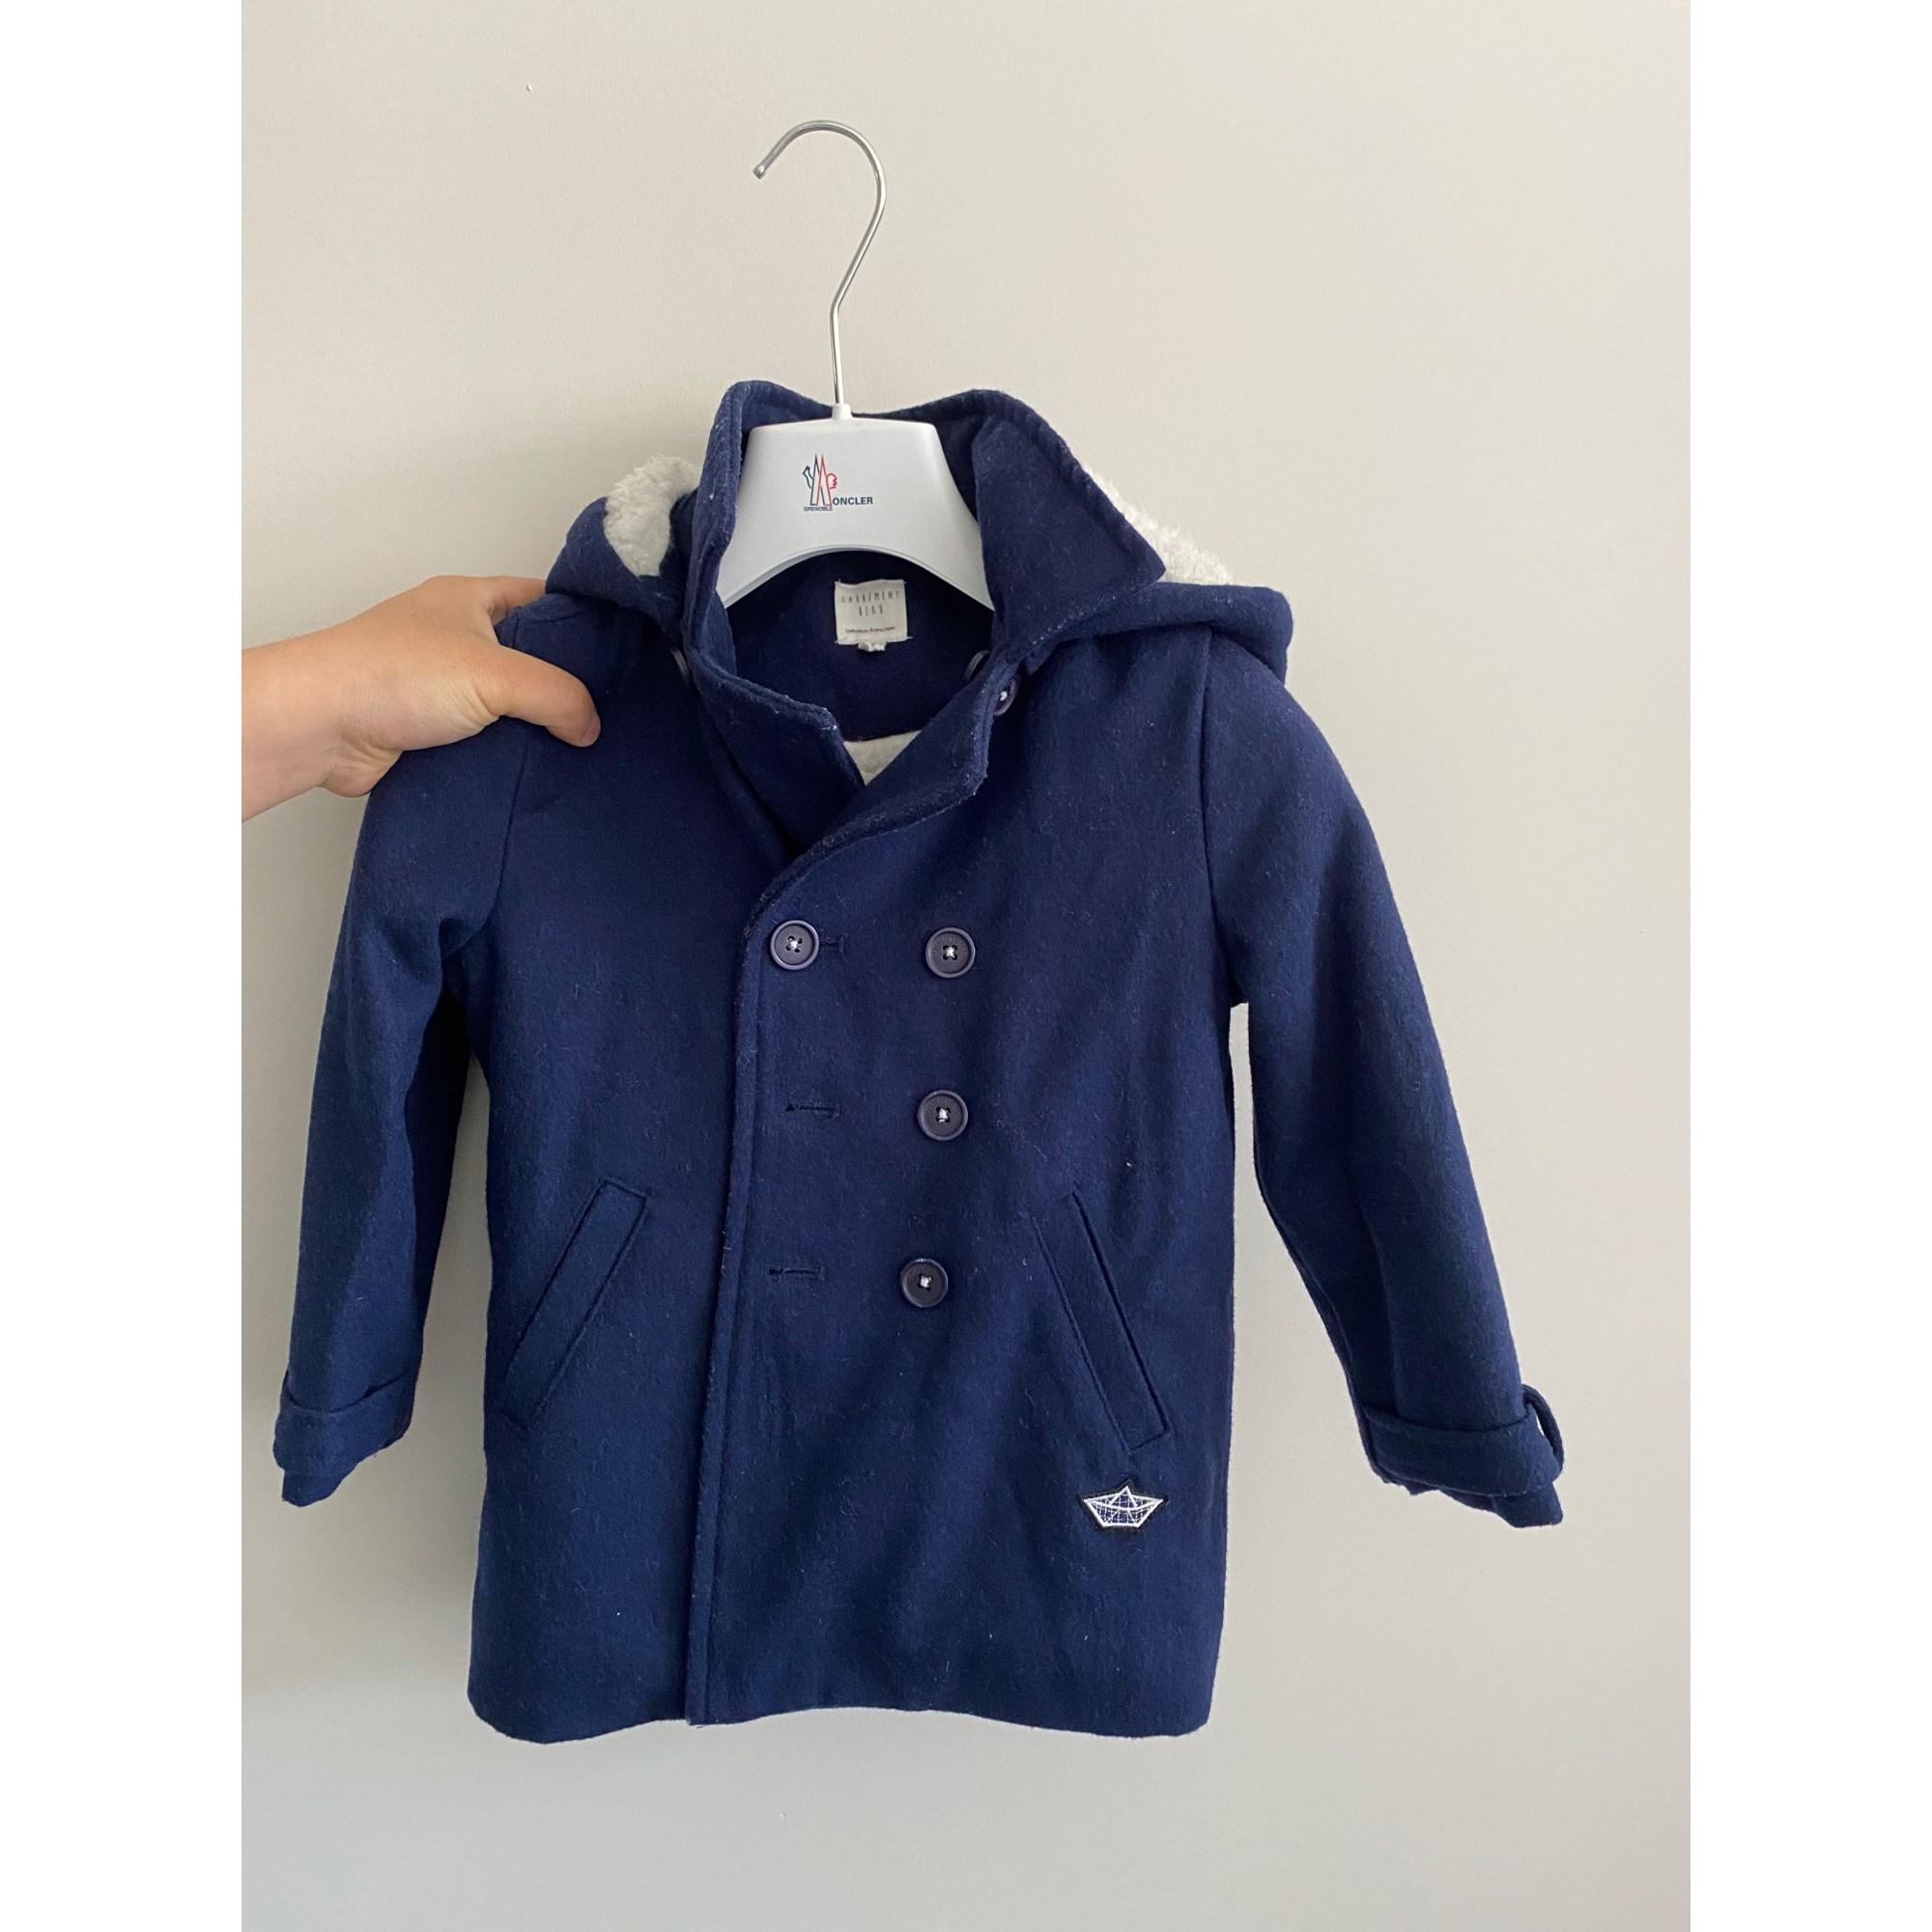 Manteau CARRÉMENT BEAU Bleu, bleu marine, bleu turquoise